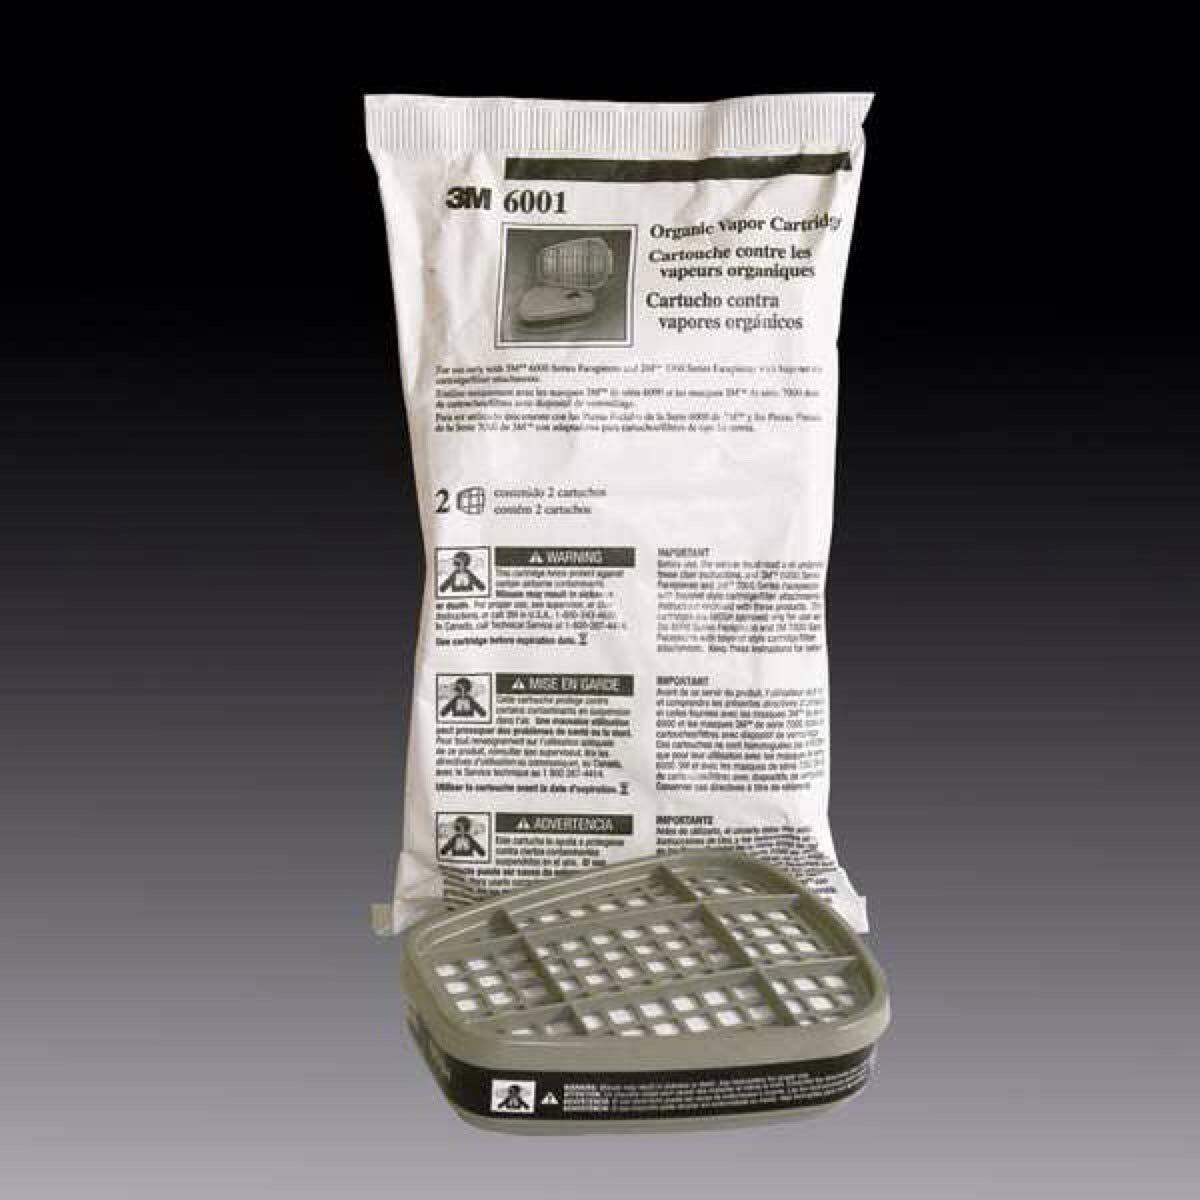 3M 6001 Organic Vapor Replacement Cartridge – Various Package Quantities Business & Industrial